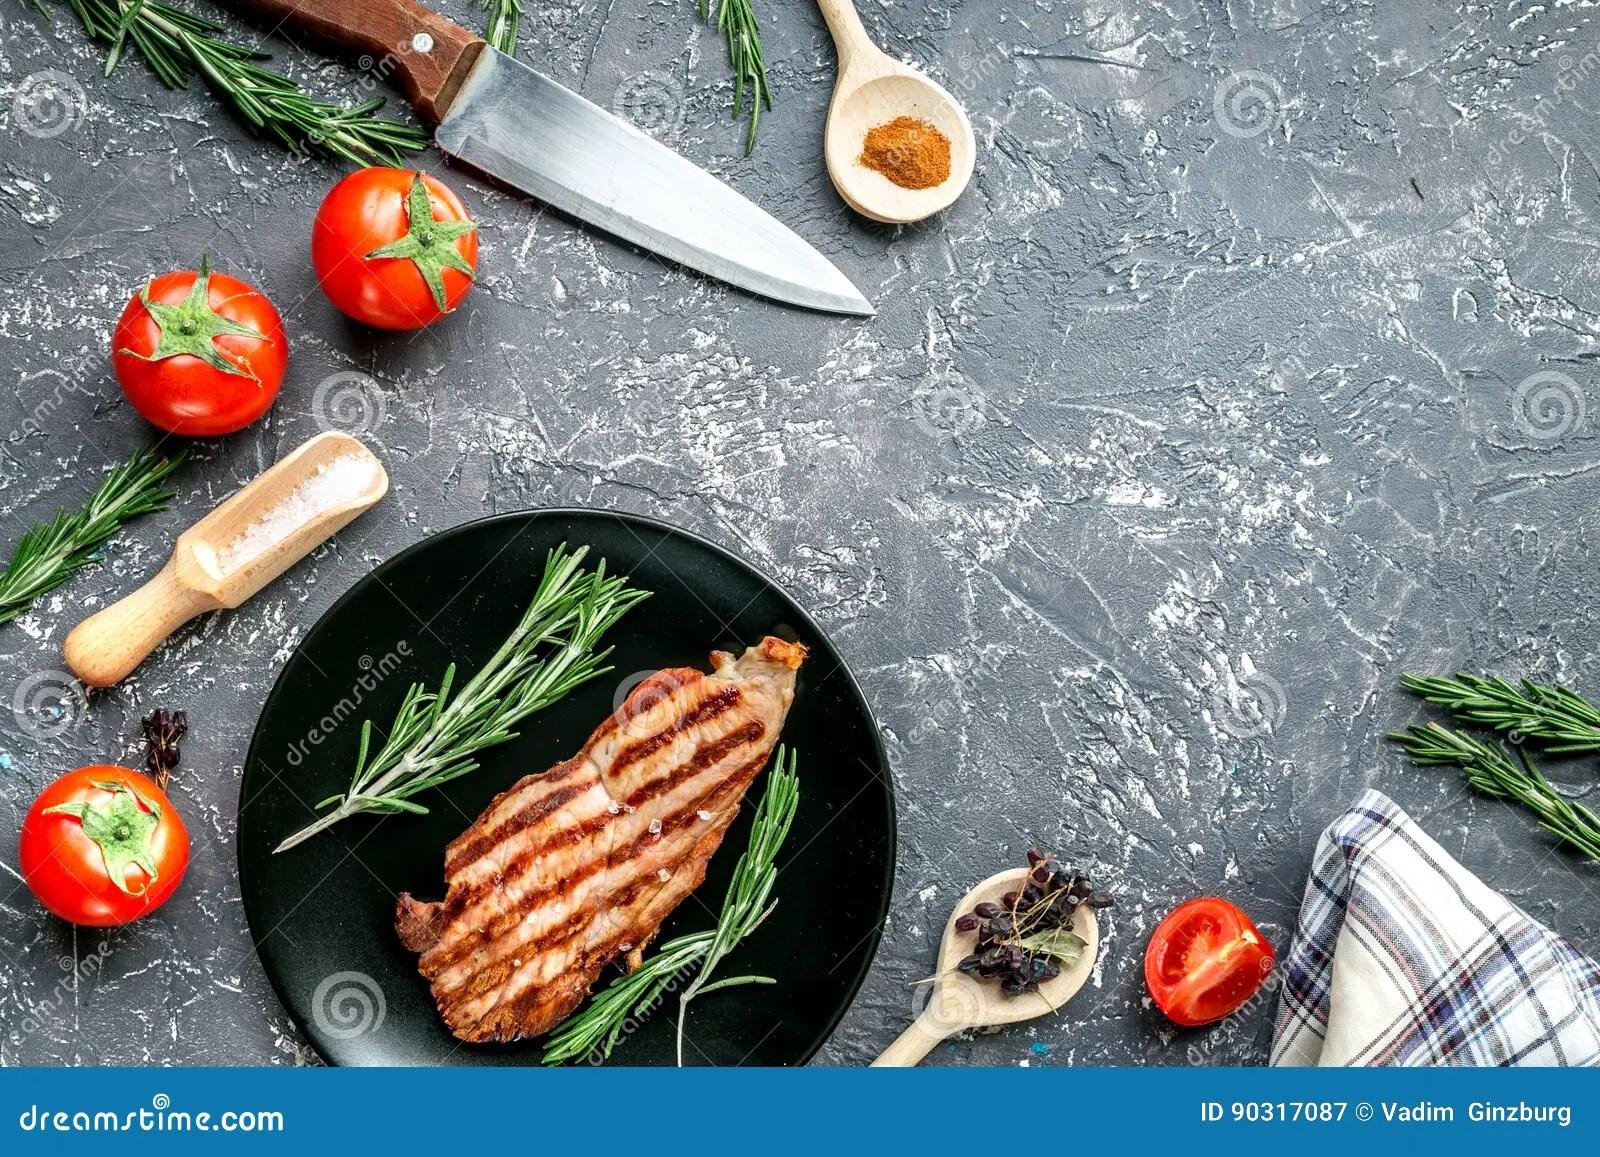 in stock kitchens farm house kitchen table 烹调用肉和香料的牛排在灰色背景顶视图大模型 库存图片. 图片 包括有 油煎, 正餐, 背包, 晚饭, 格栅 ...